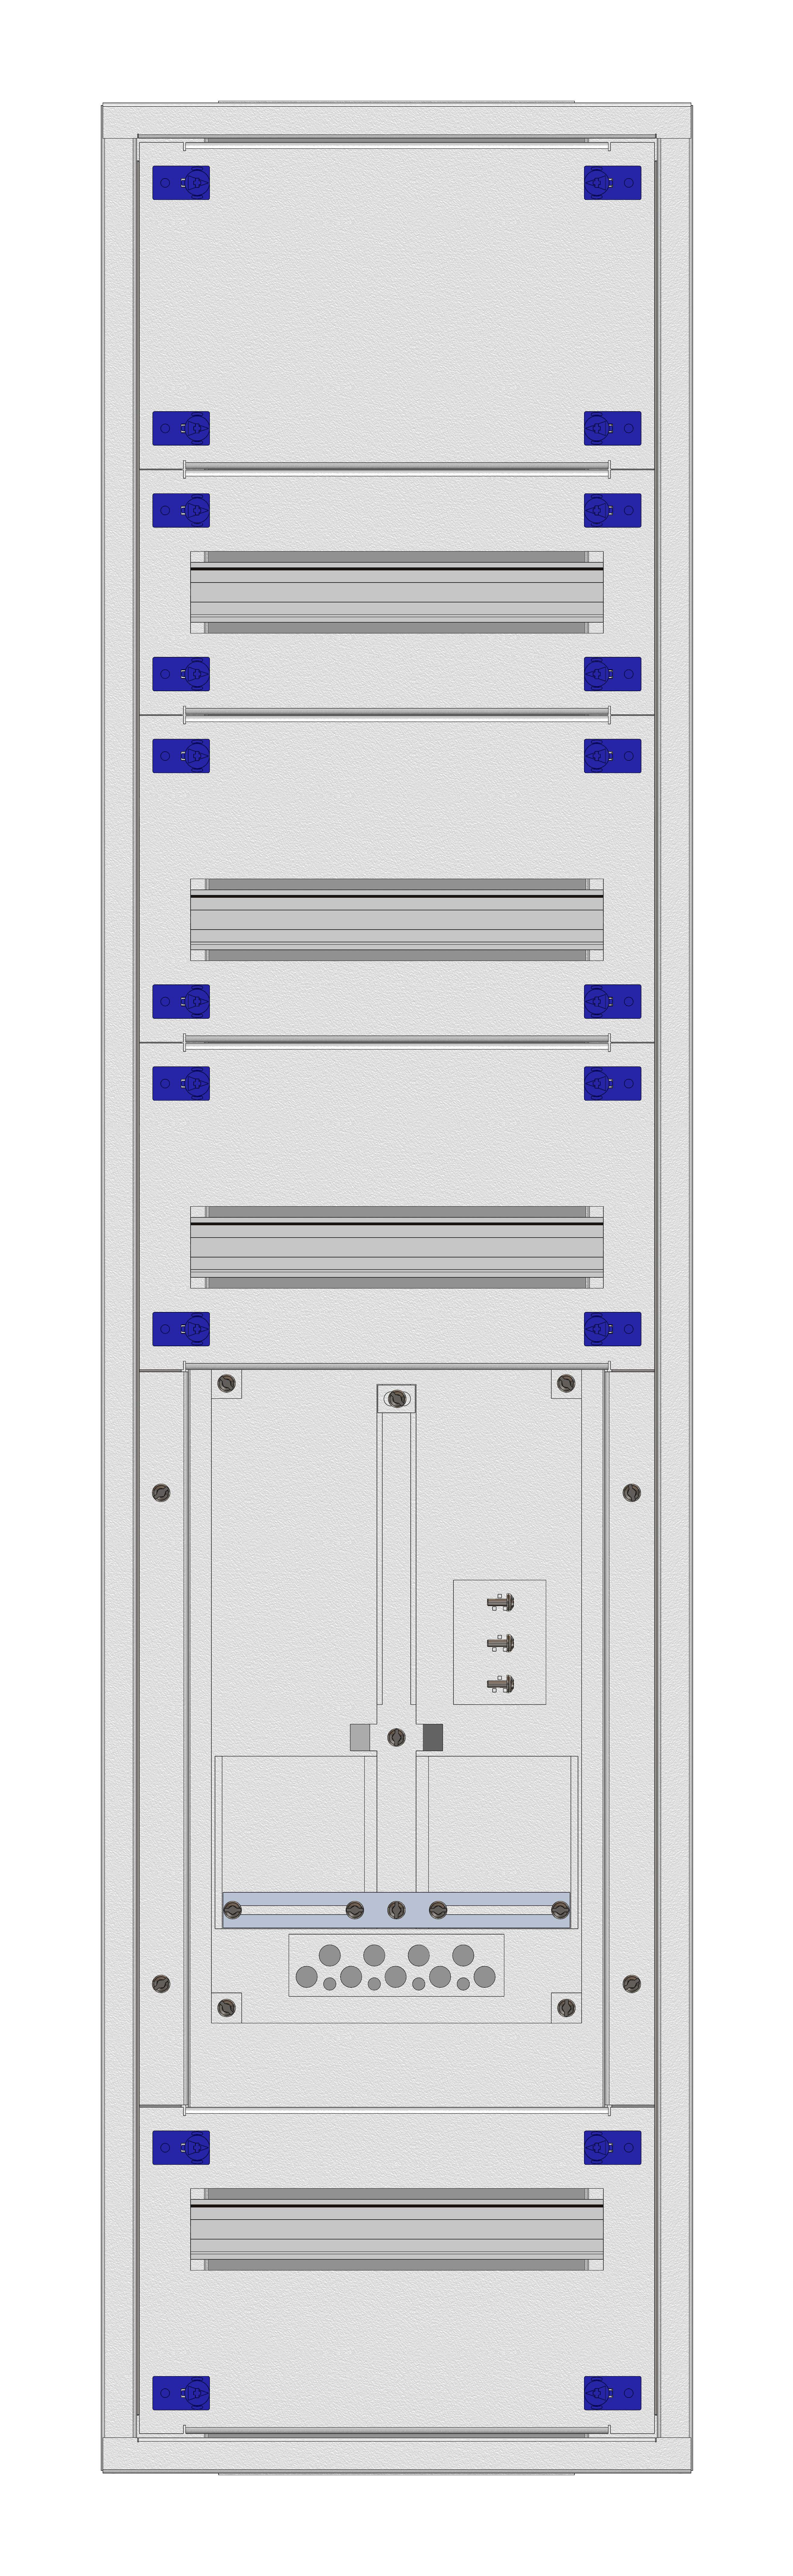 1 Stk Aufputz-Zählerverteiler 1A-28E/VBG 1ZP, H1380B380T250mm IL160128VS